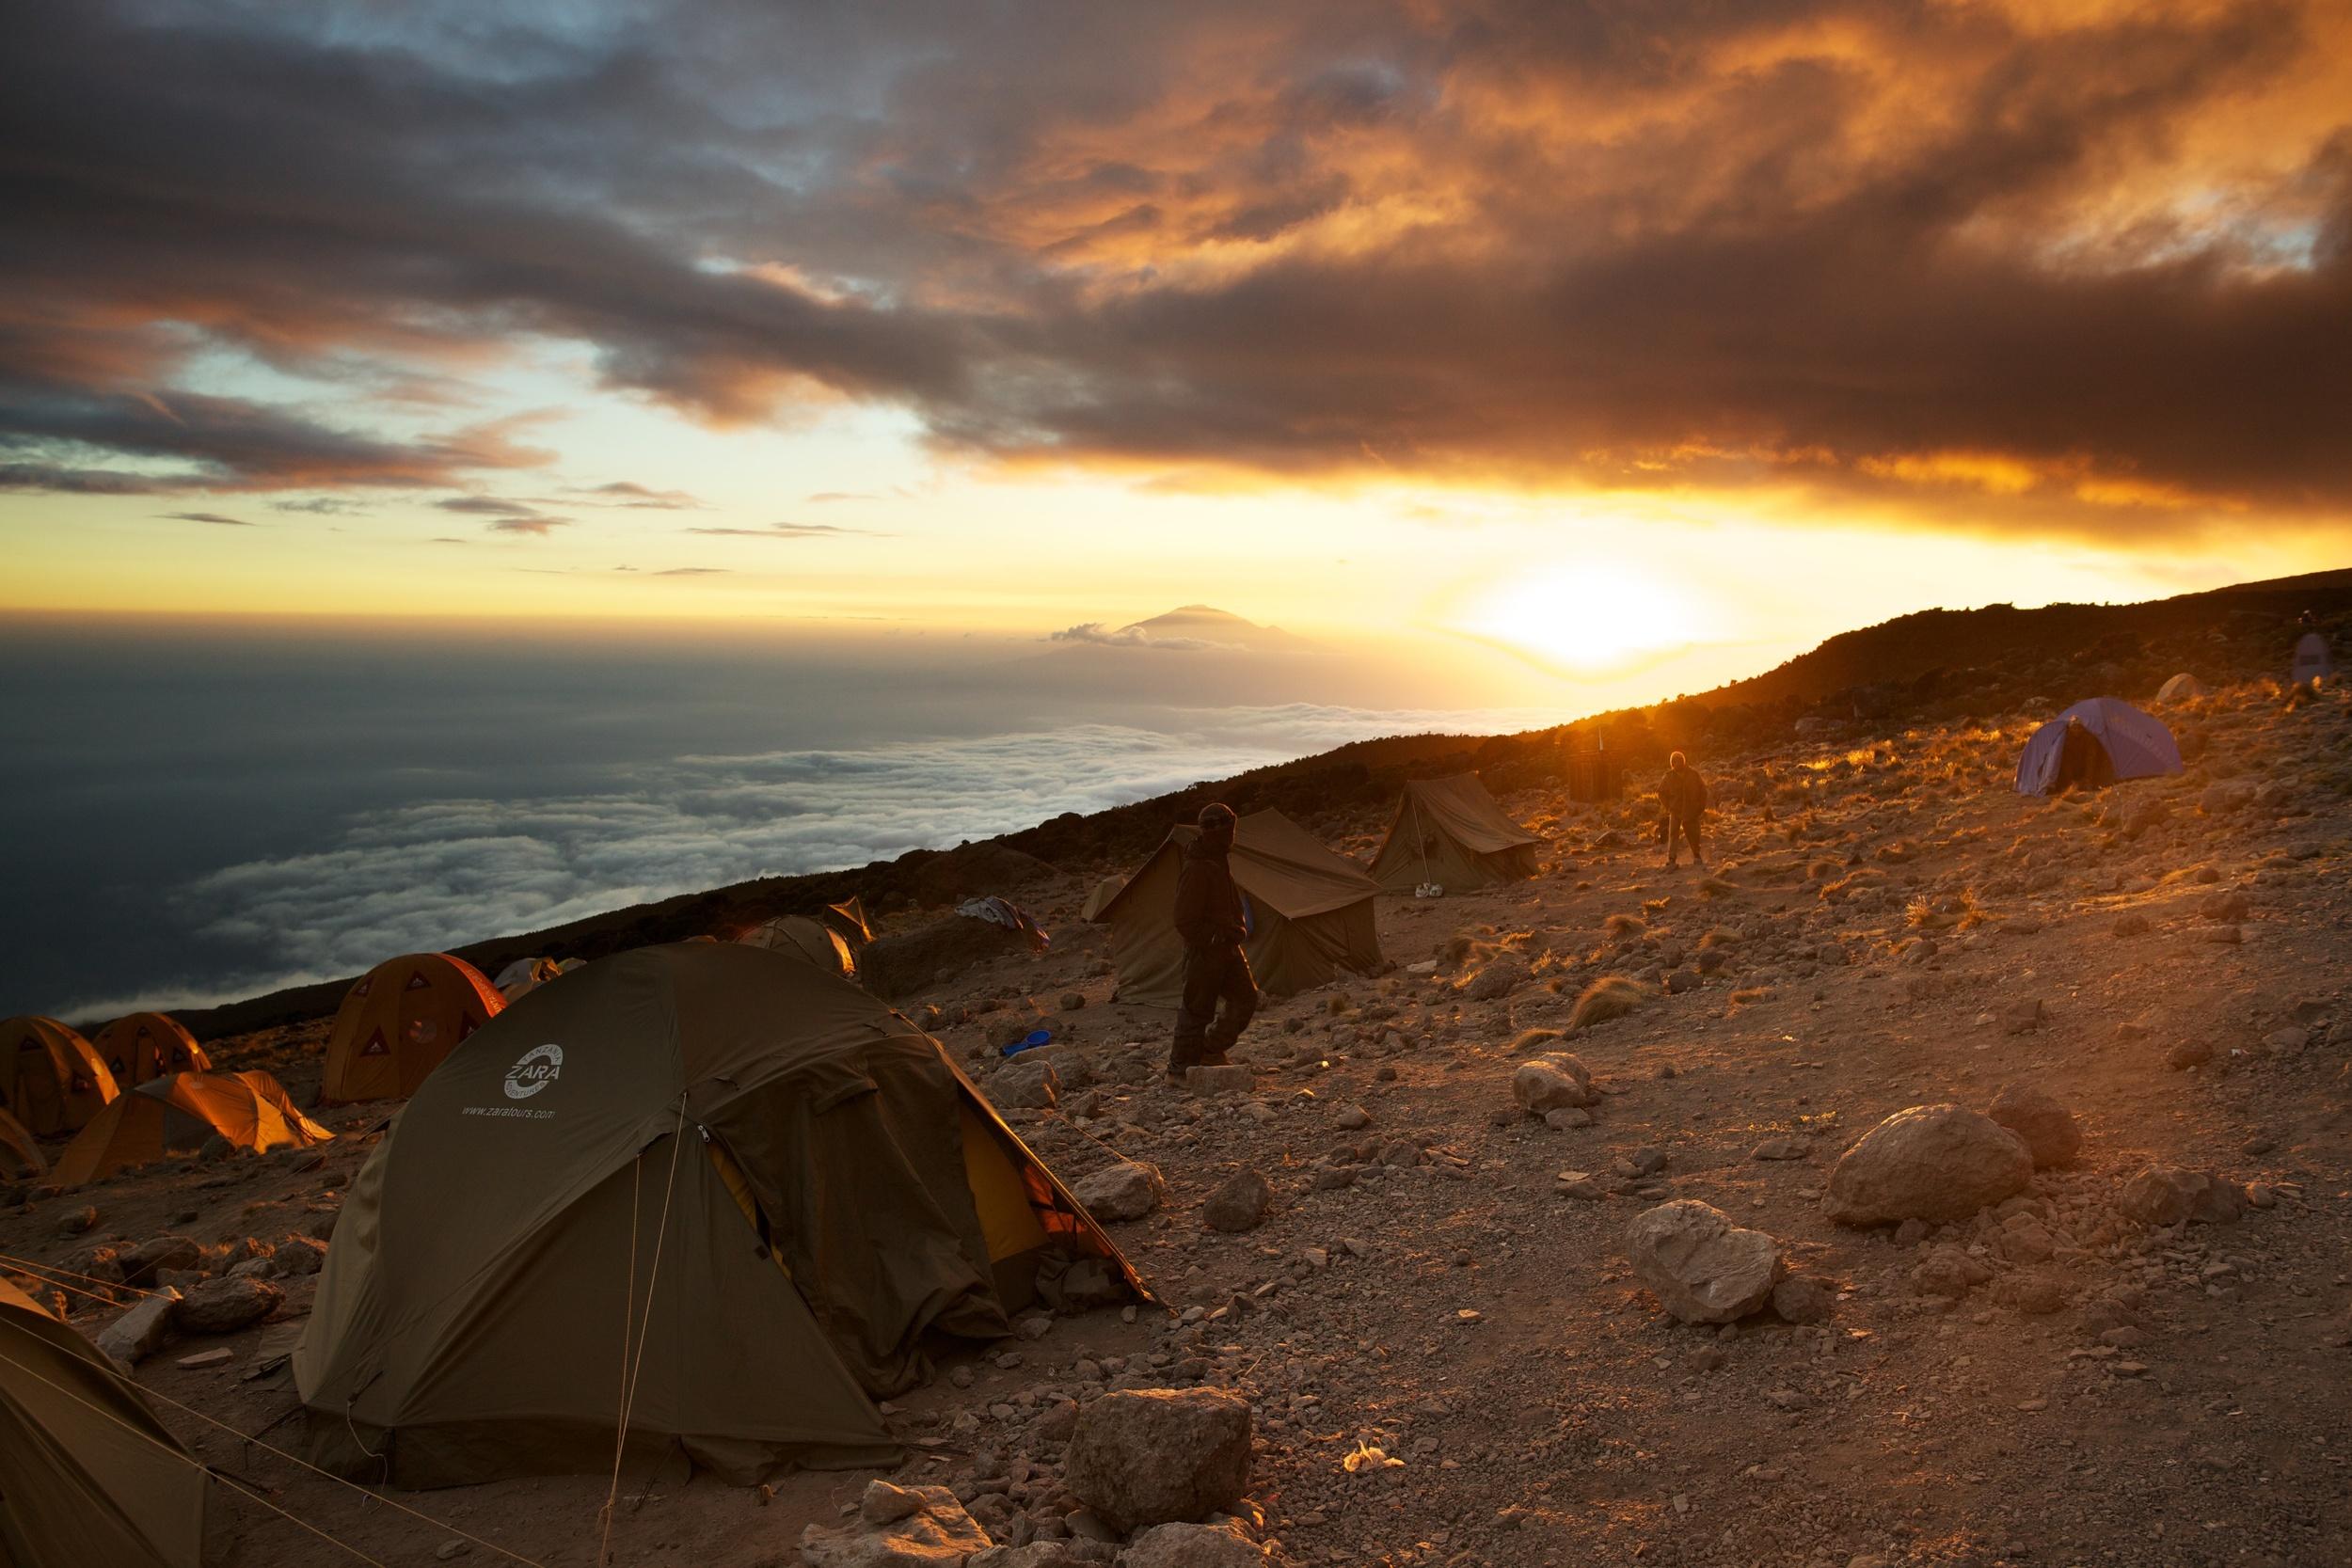 Sunset at Karanga Camp, Kilimanjaro (TZ)